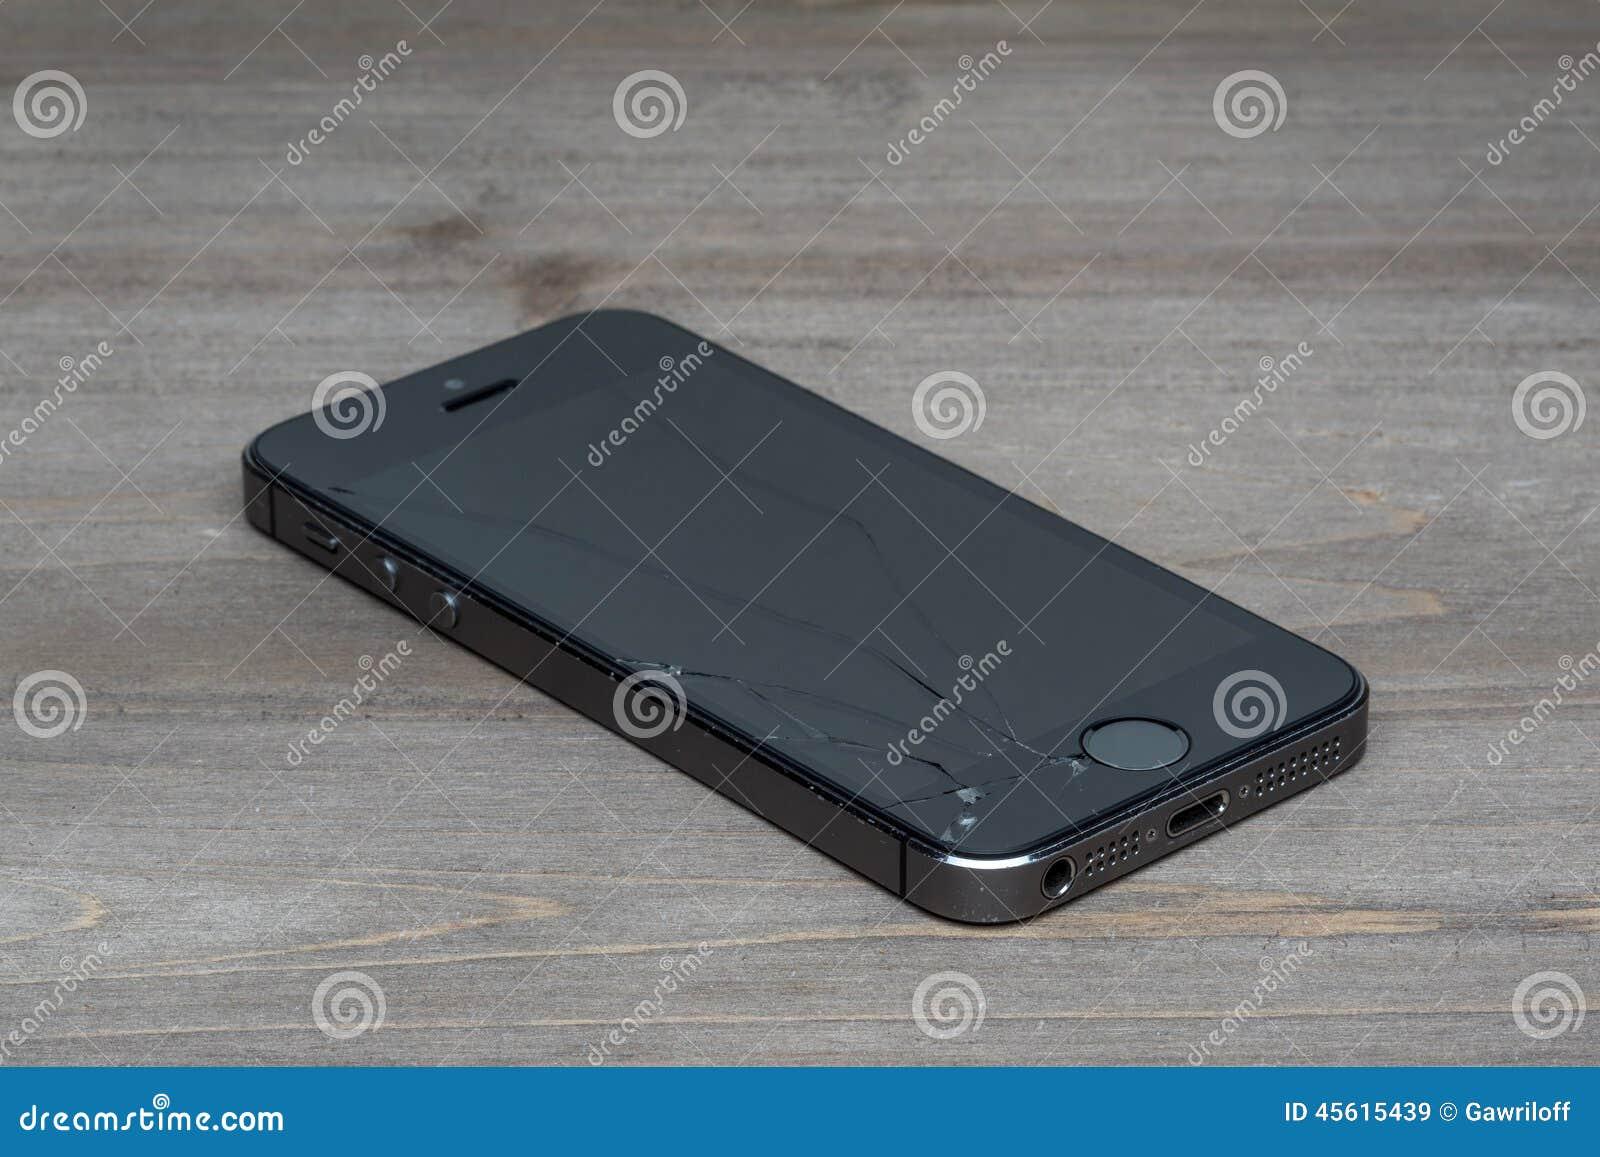 Photo of a broken iPhone 5